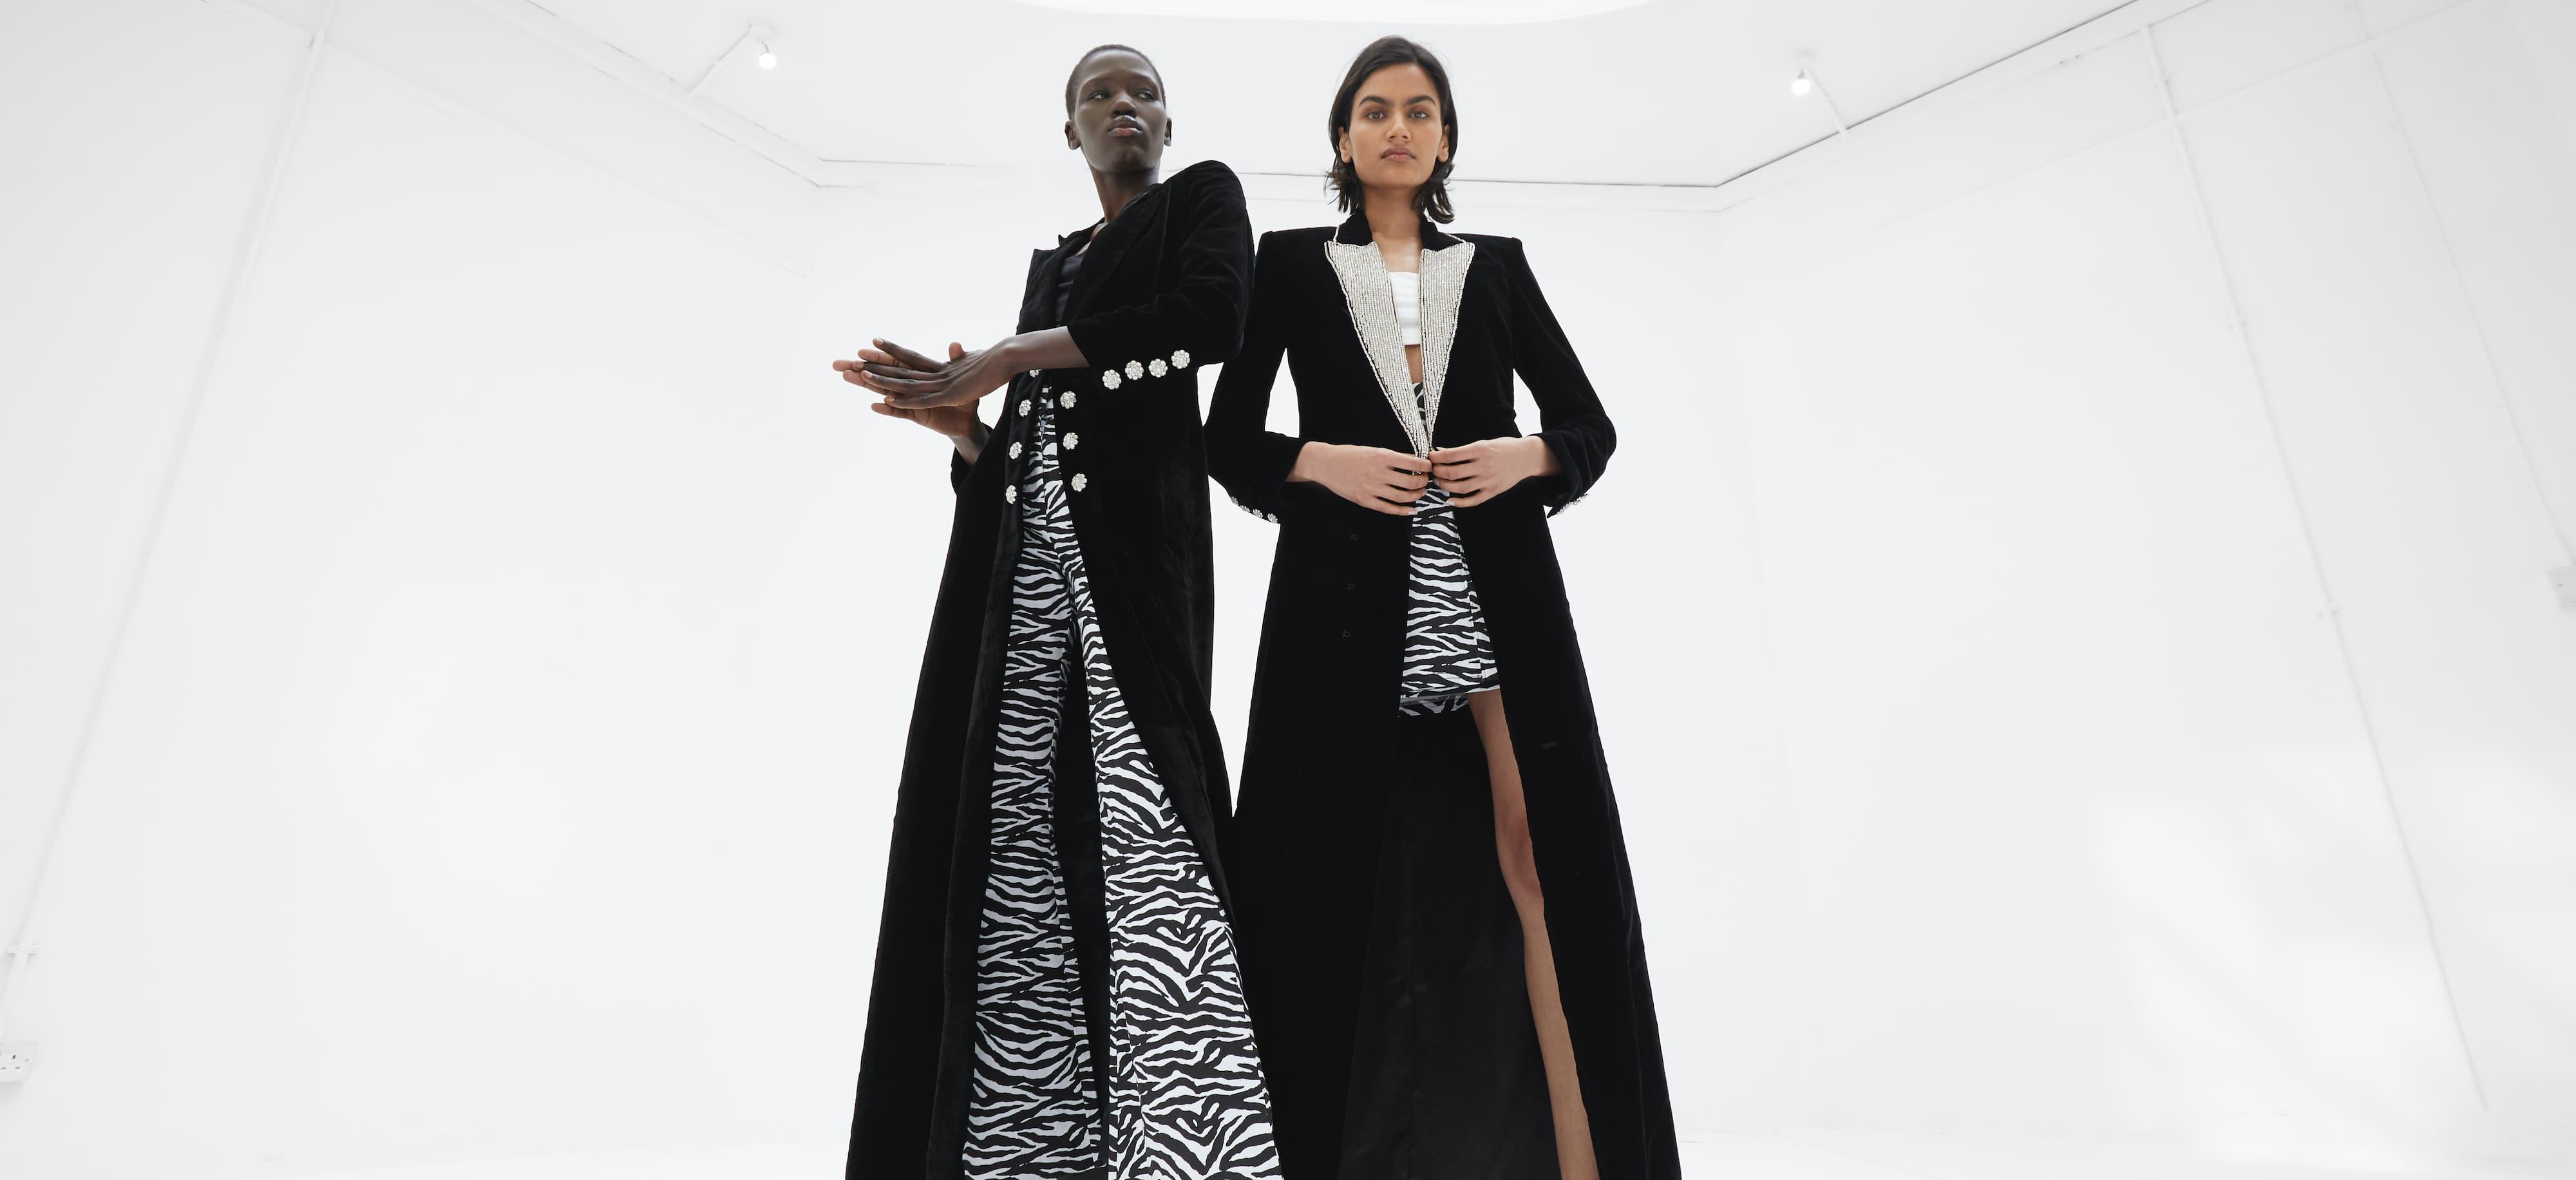 2 models wearing the Khanum's Kimonos